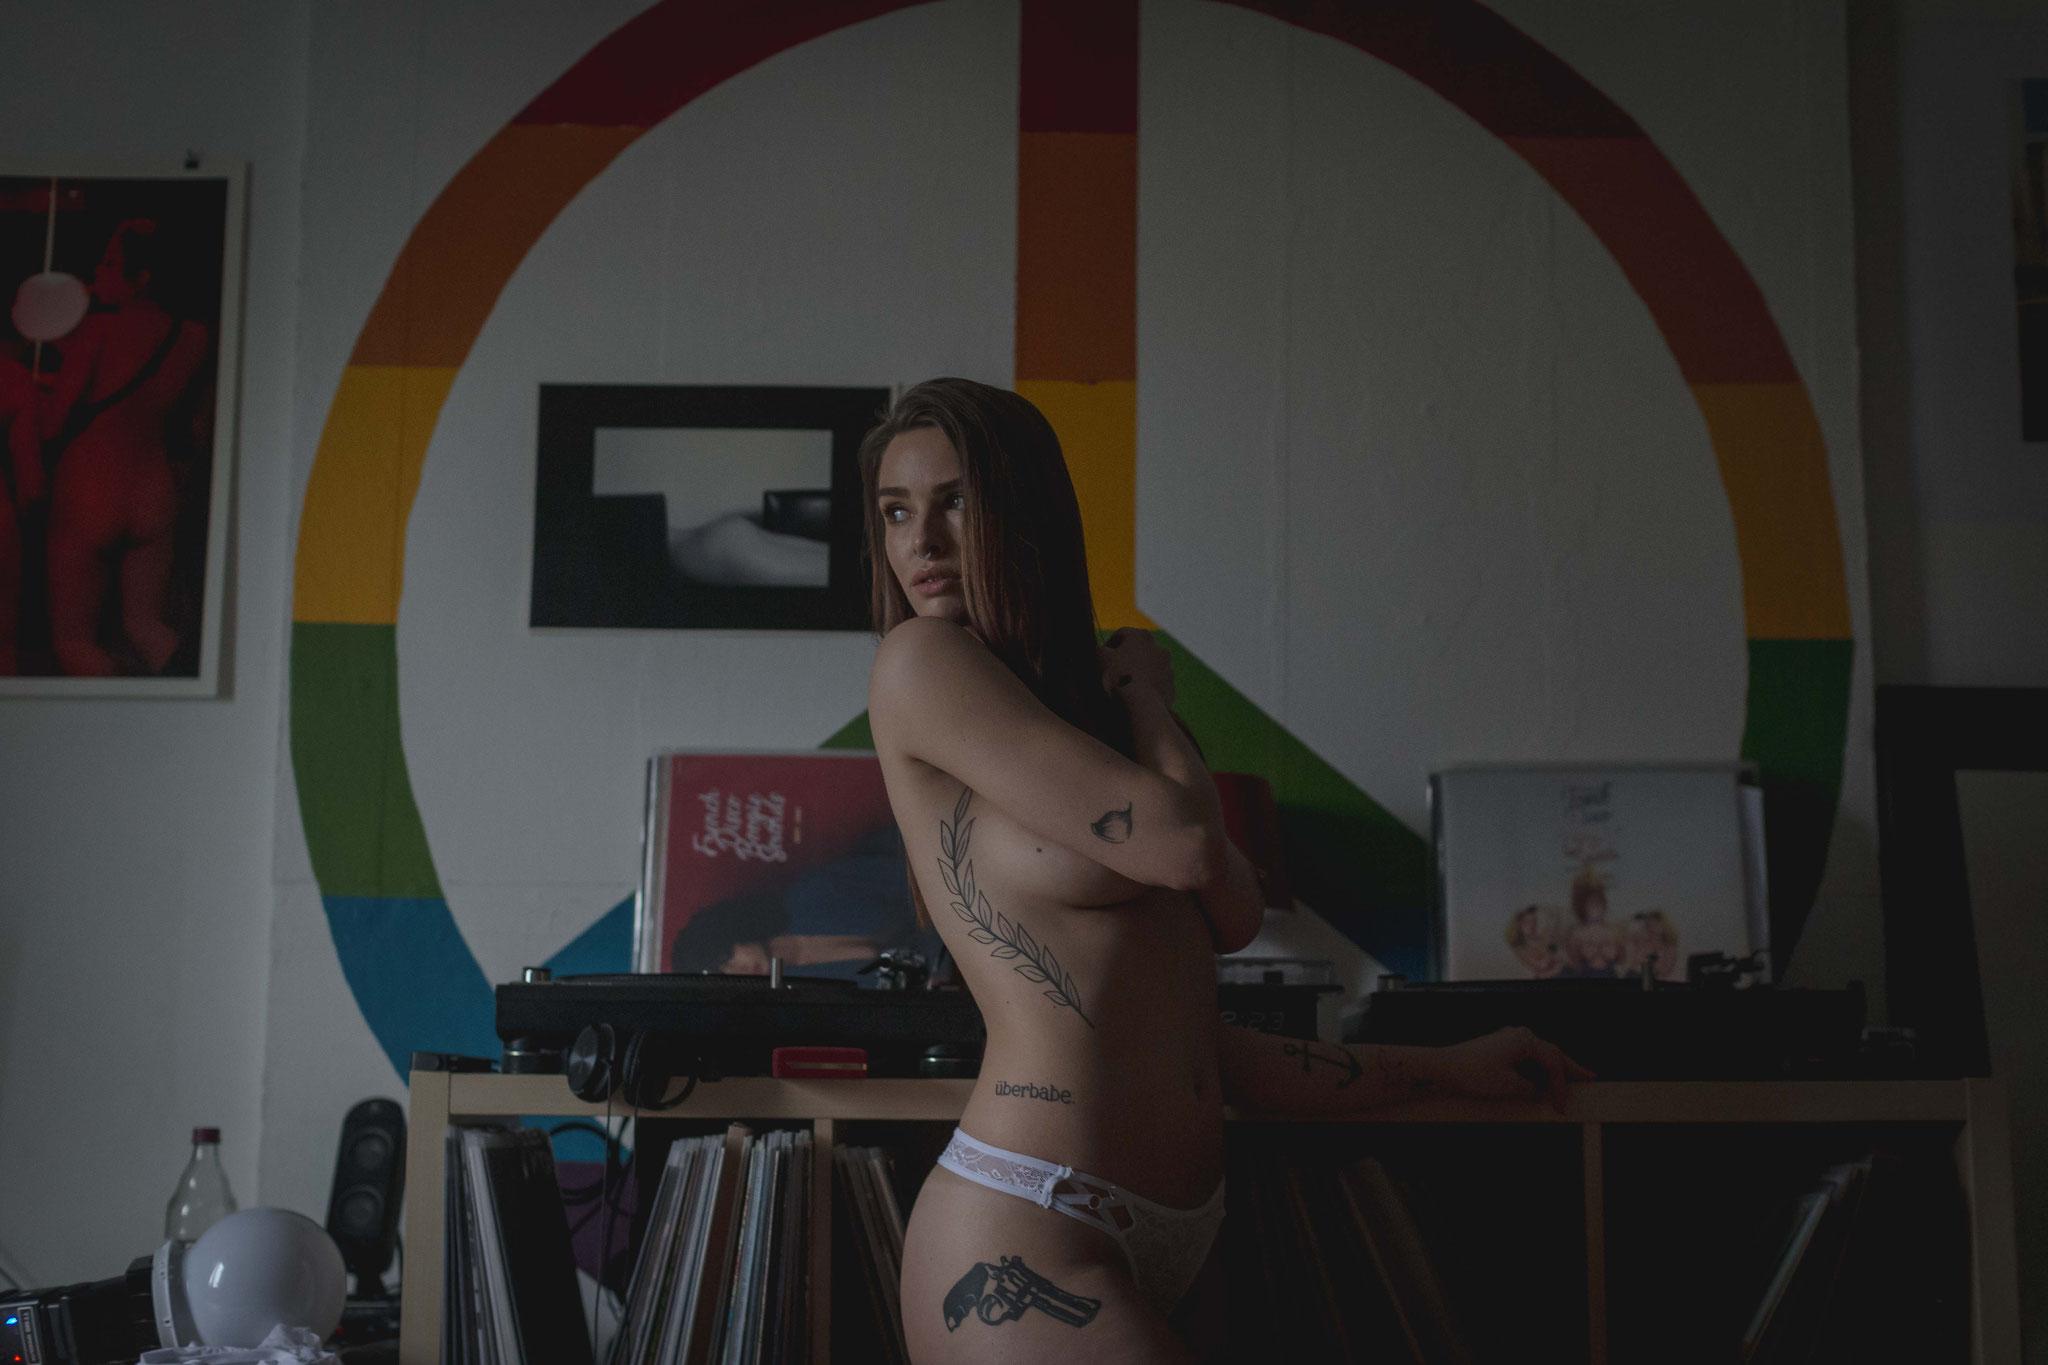 Taesh Seebacher / HMU by Emily Schroeder